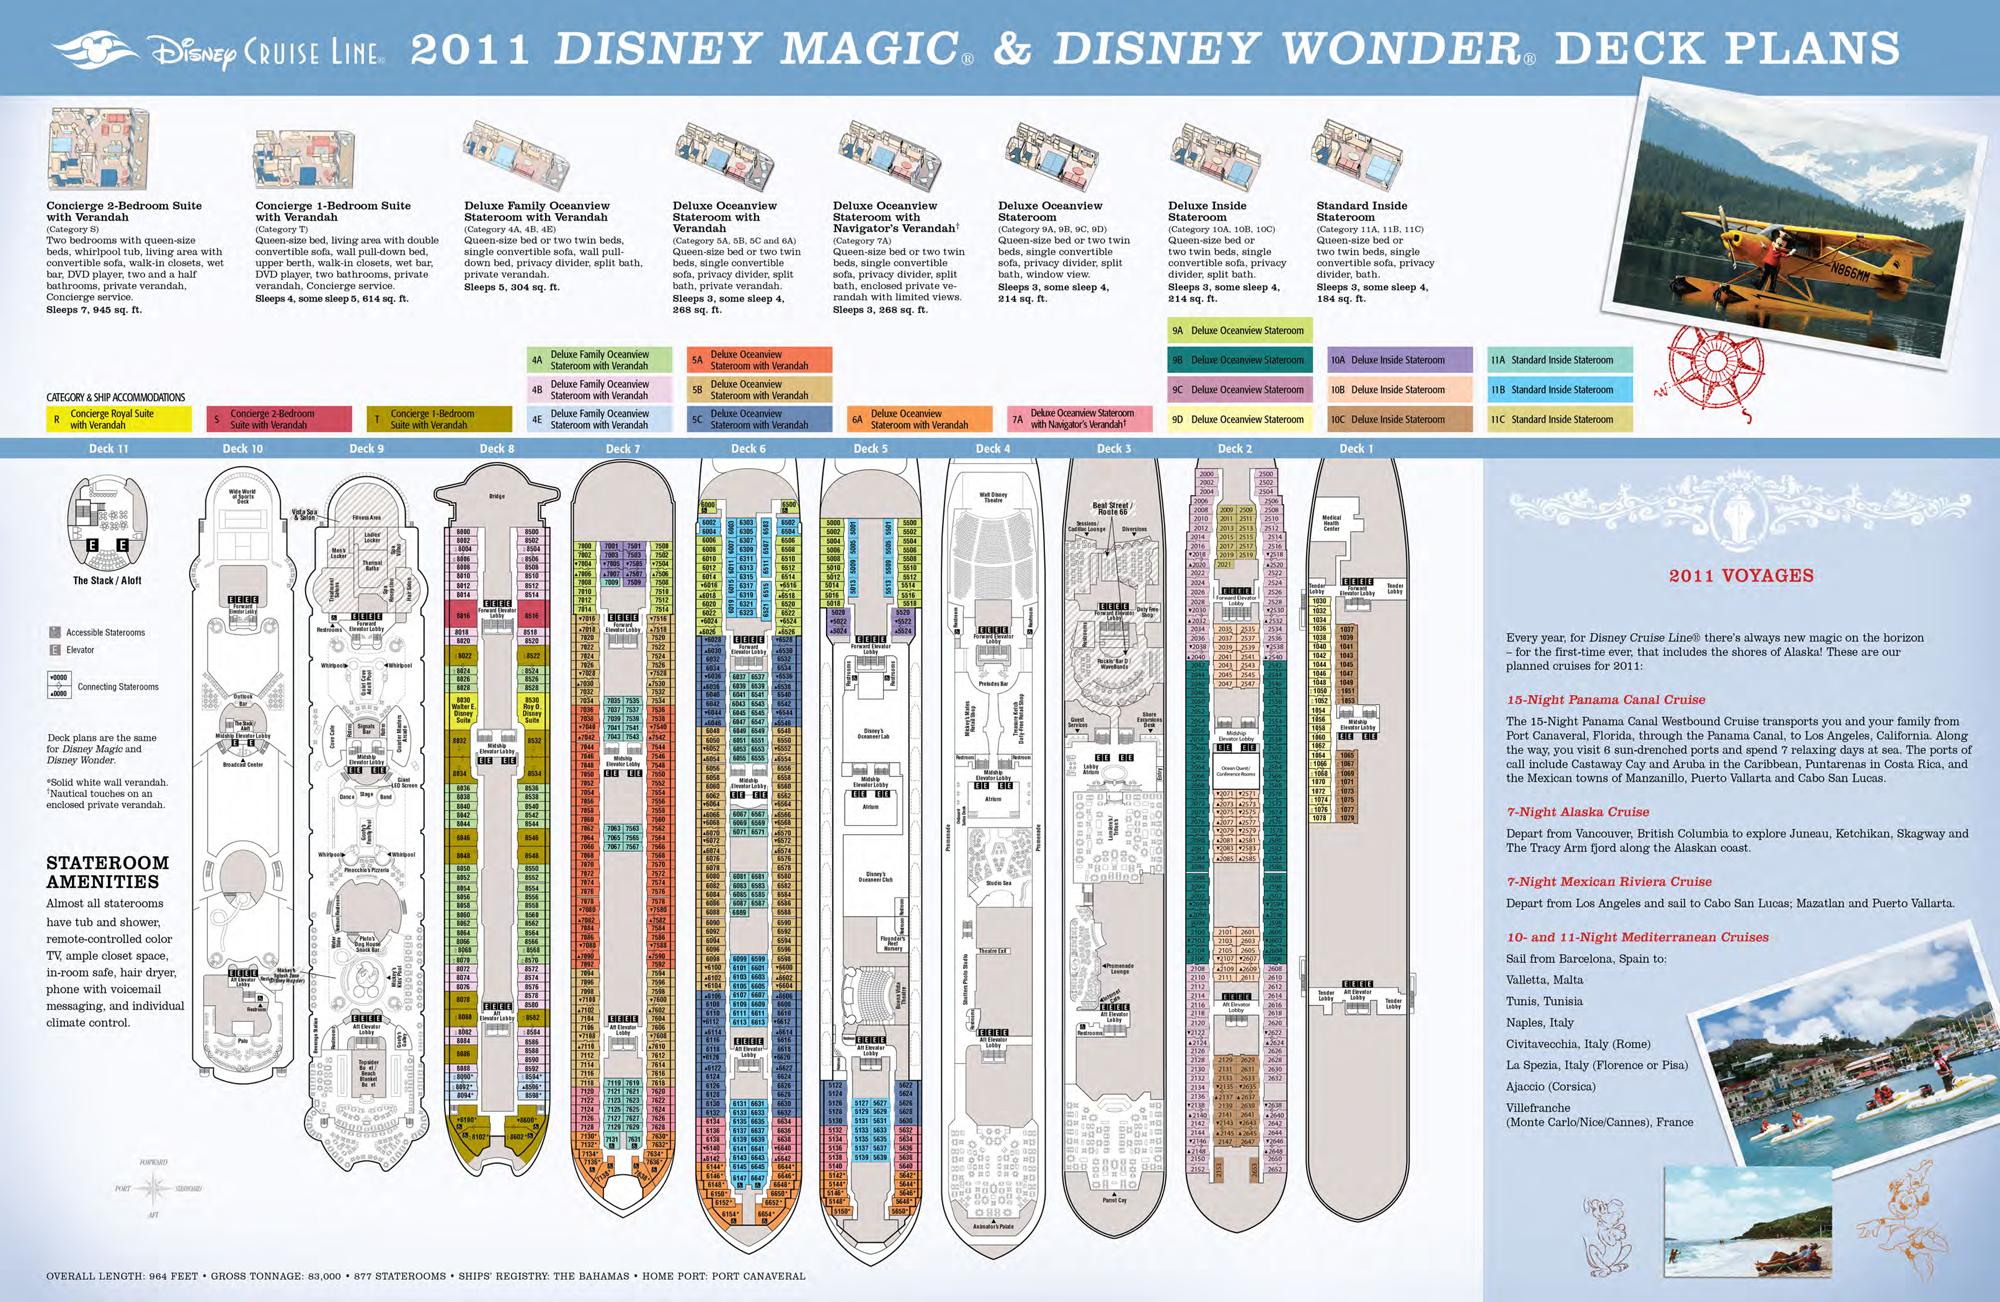 2011 Disney Cruise Deck Plans